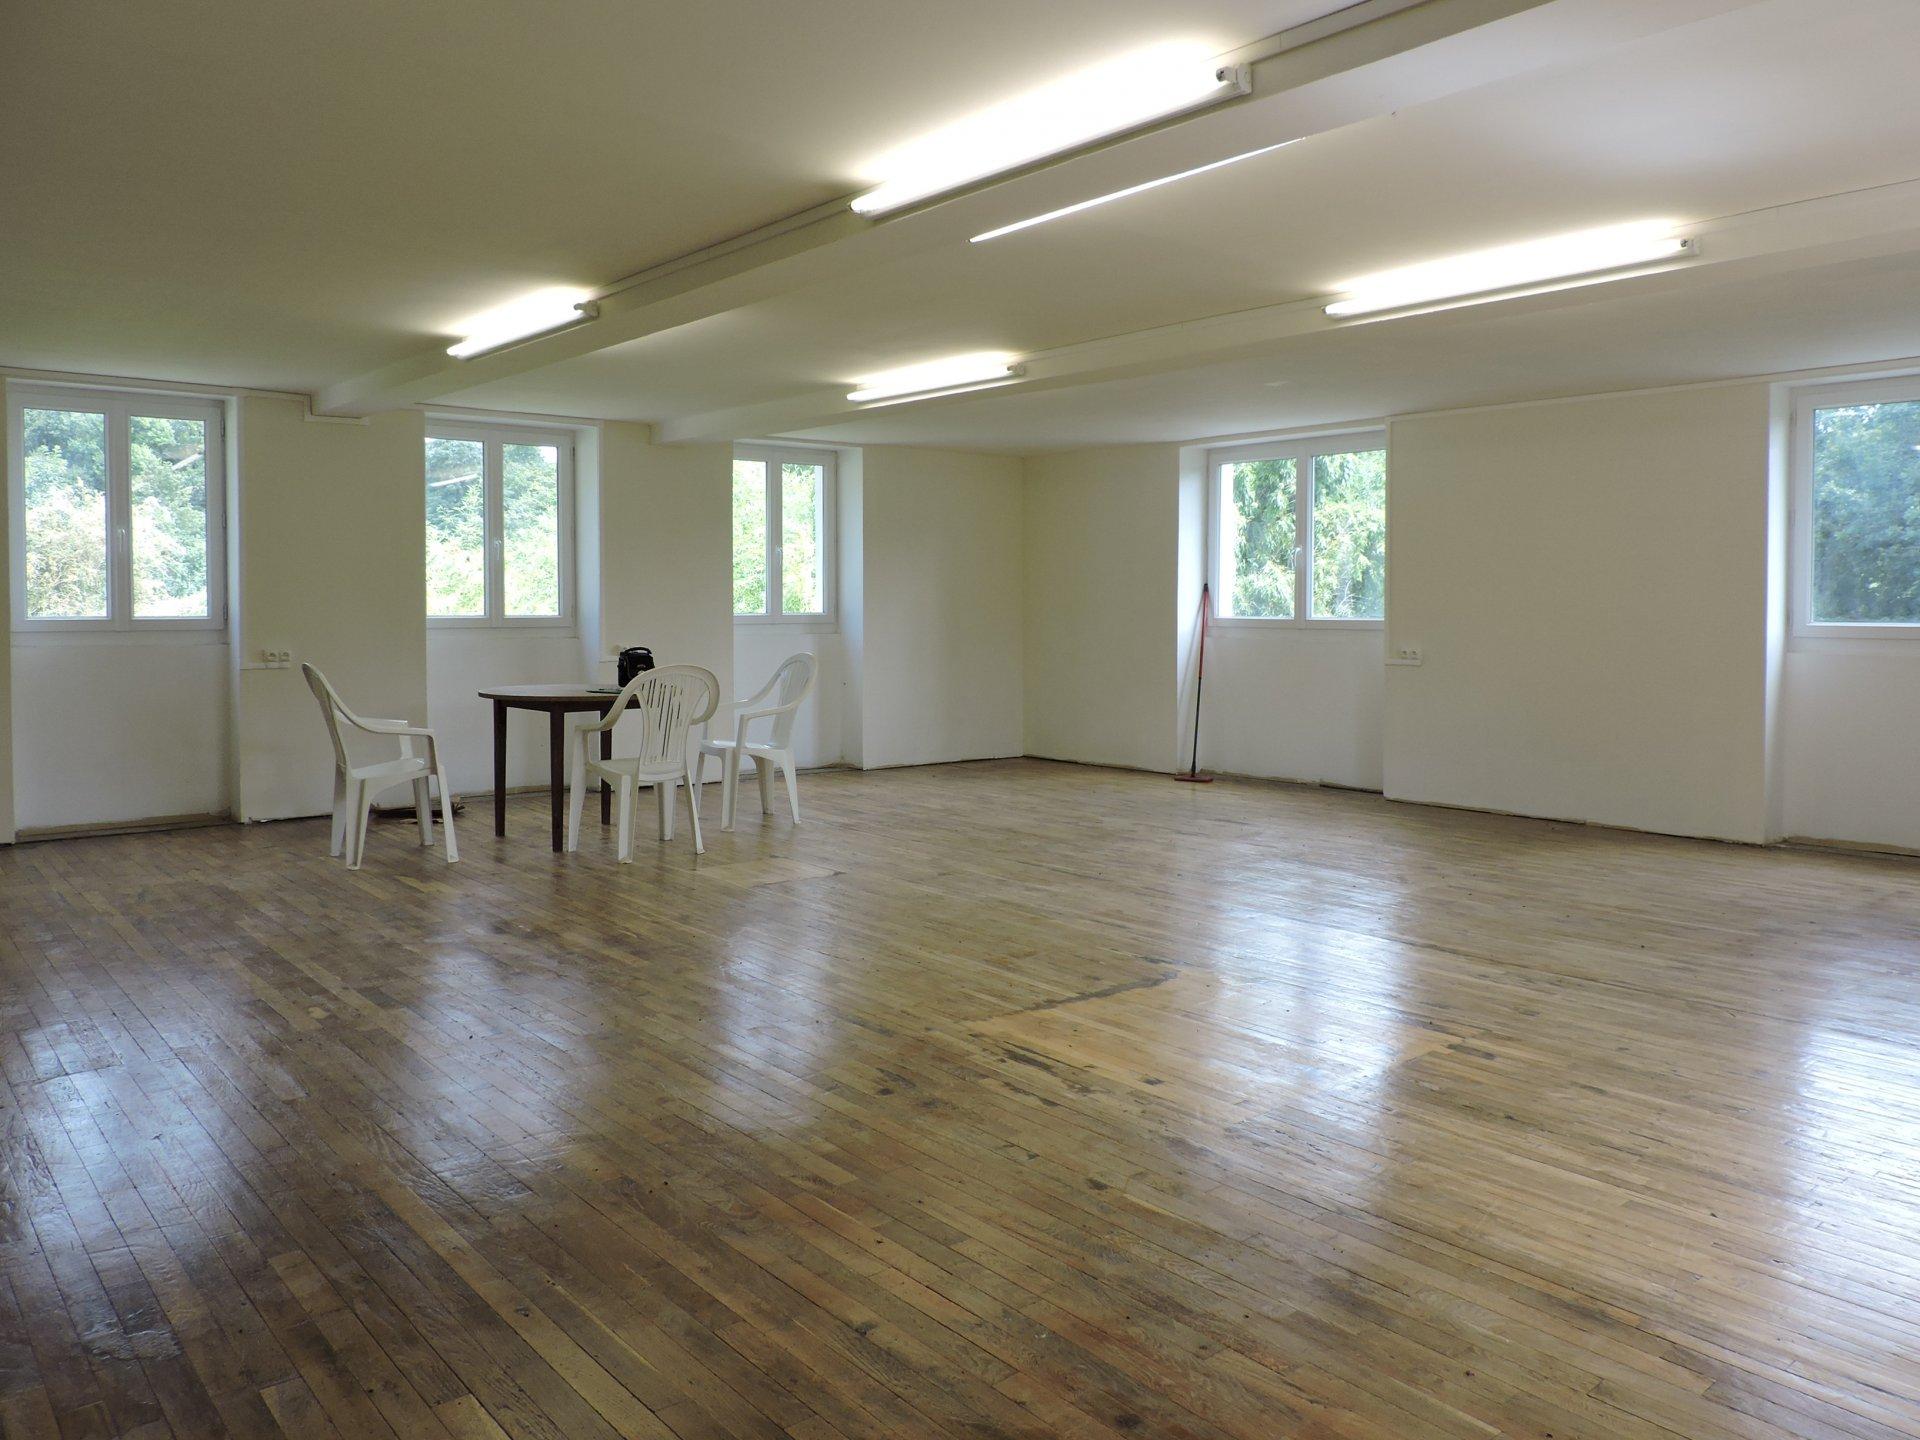 Reception room on the 1st floor